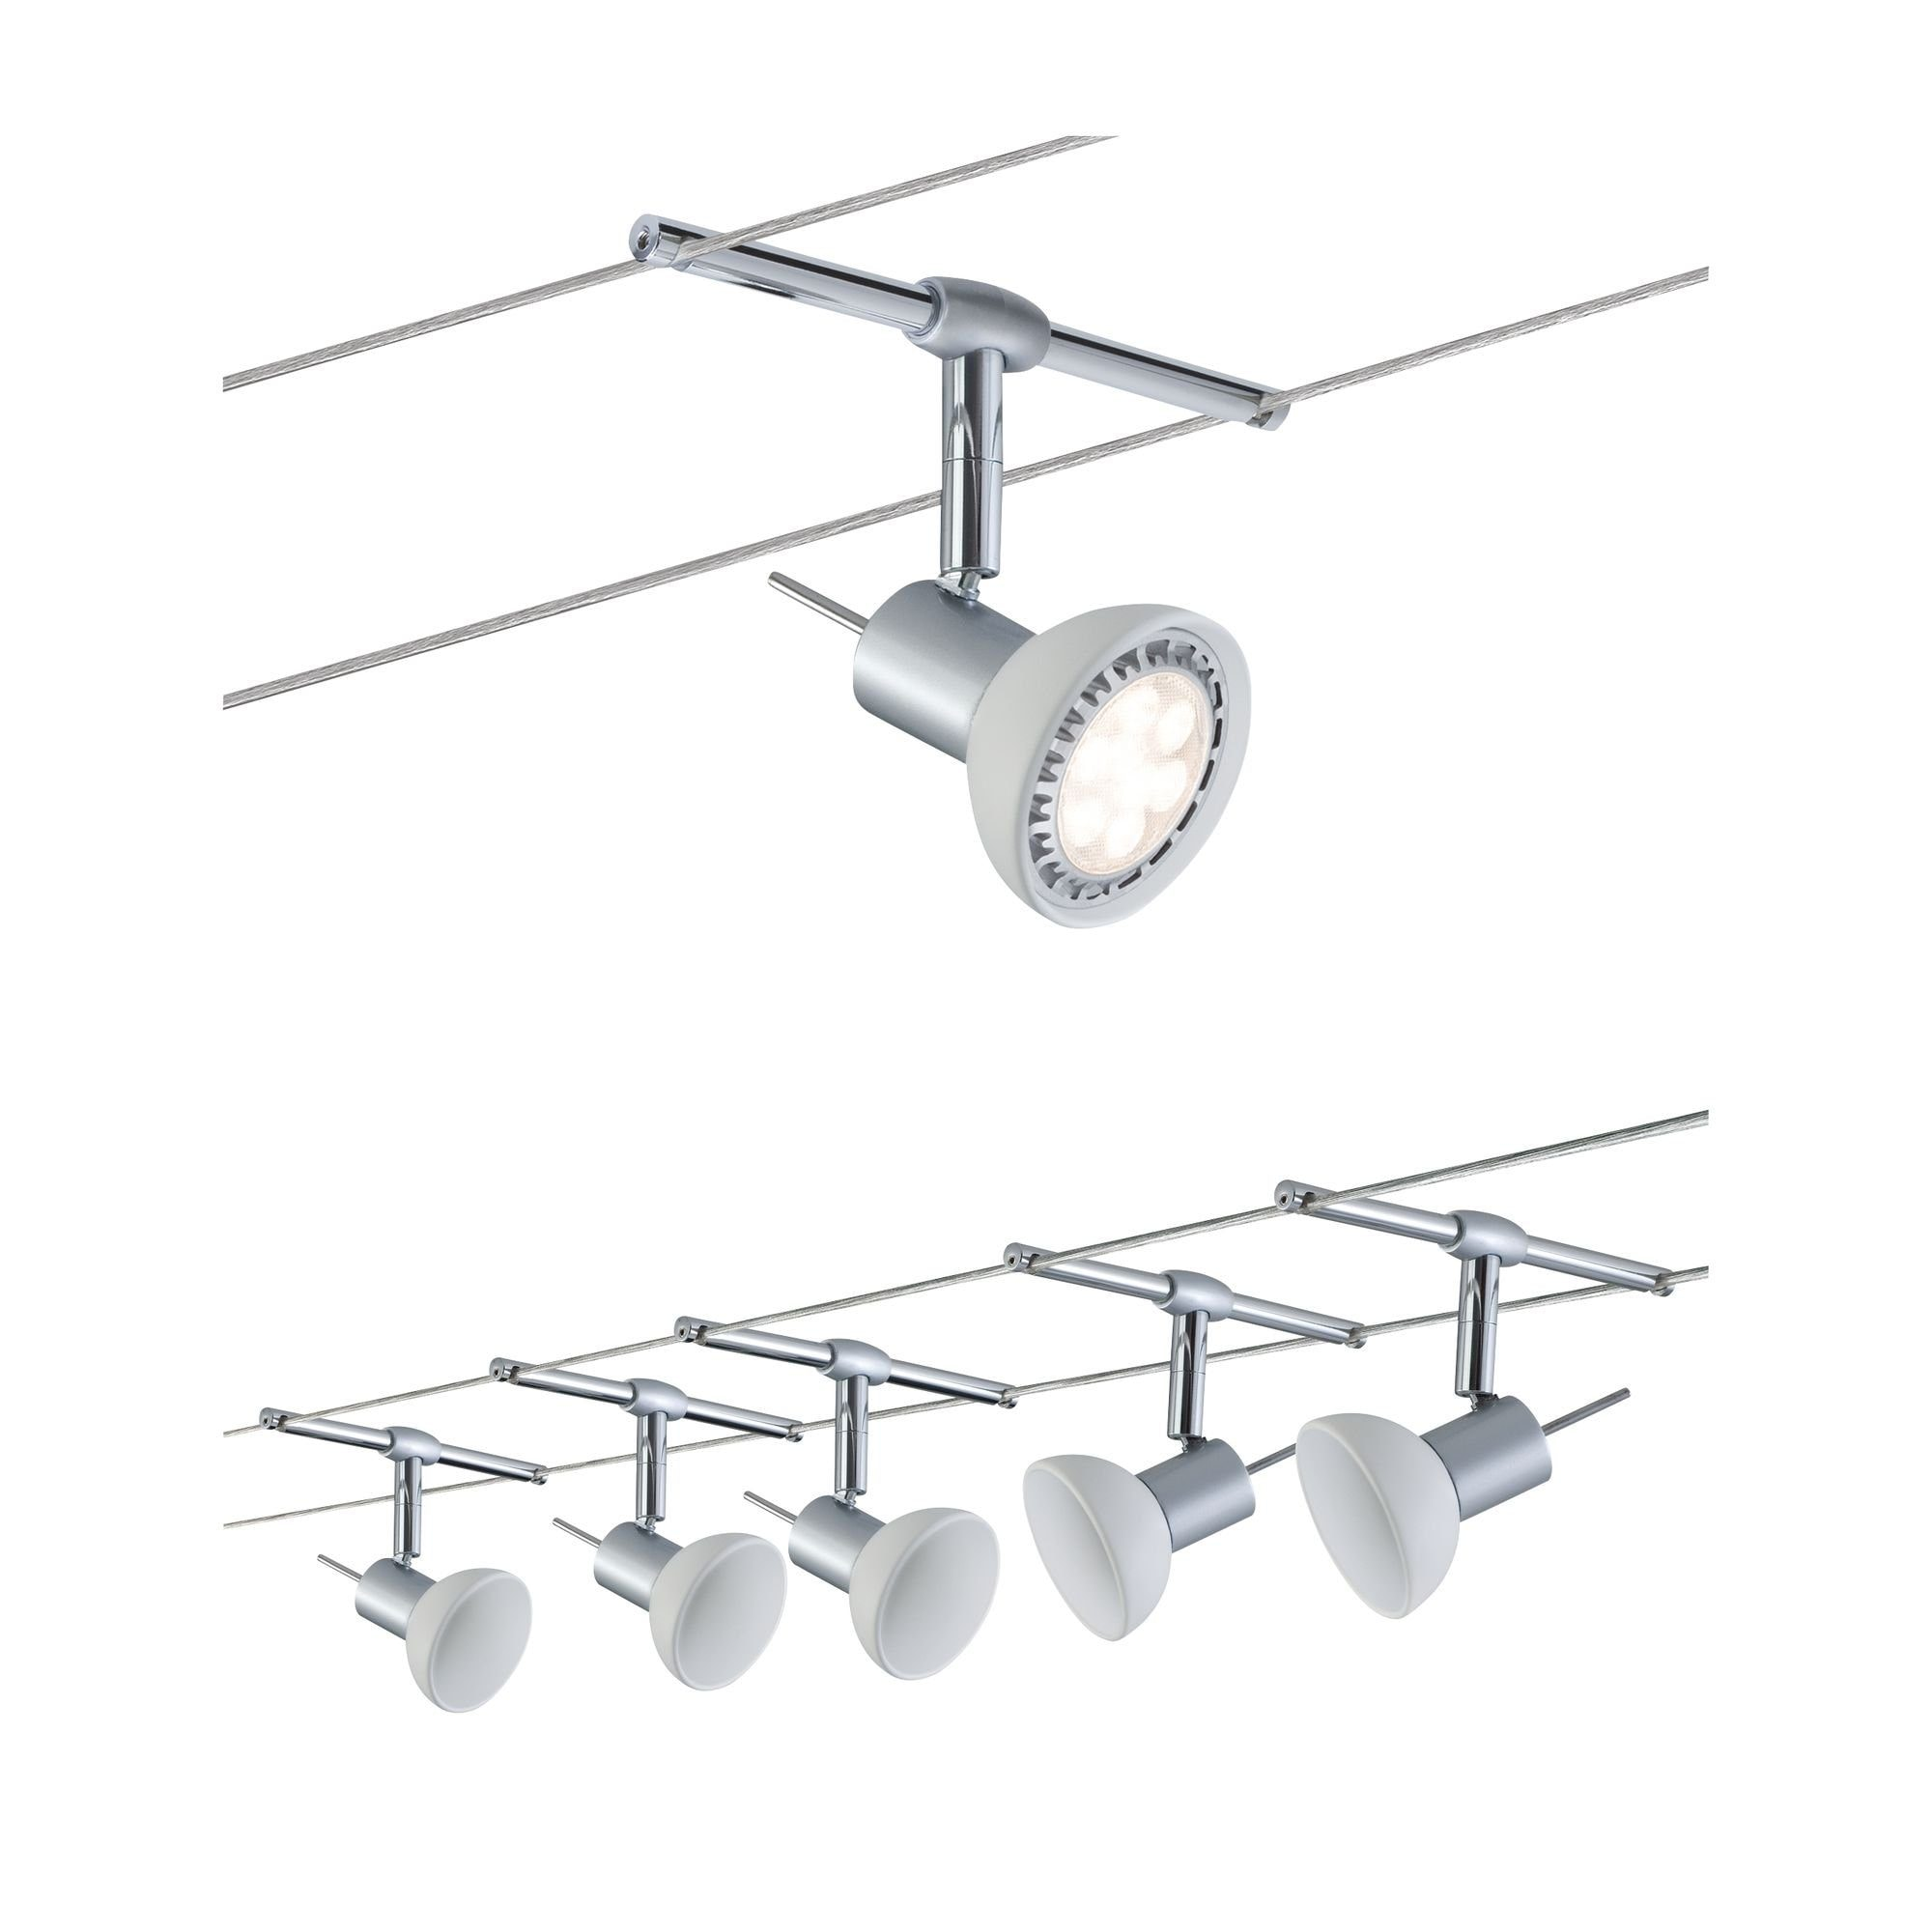 Paulmann LED Deckenleuchte Seilsystem Sheela Chrom matt mit 5 Spots max. 10W GU5,3, GU 5,3, 1 St.